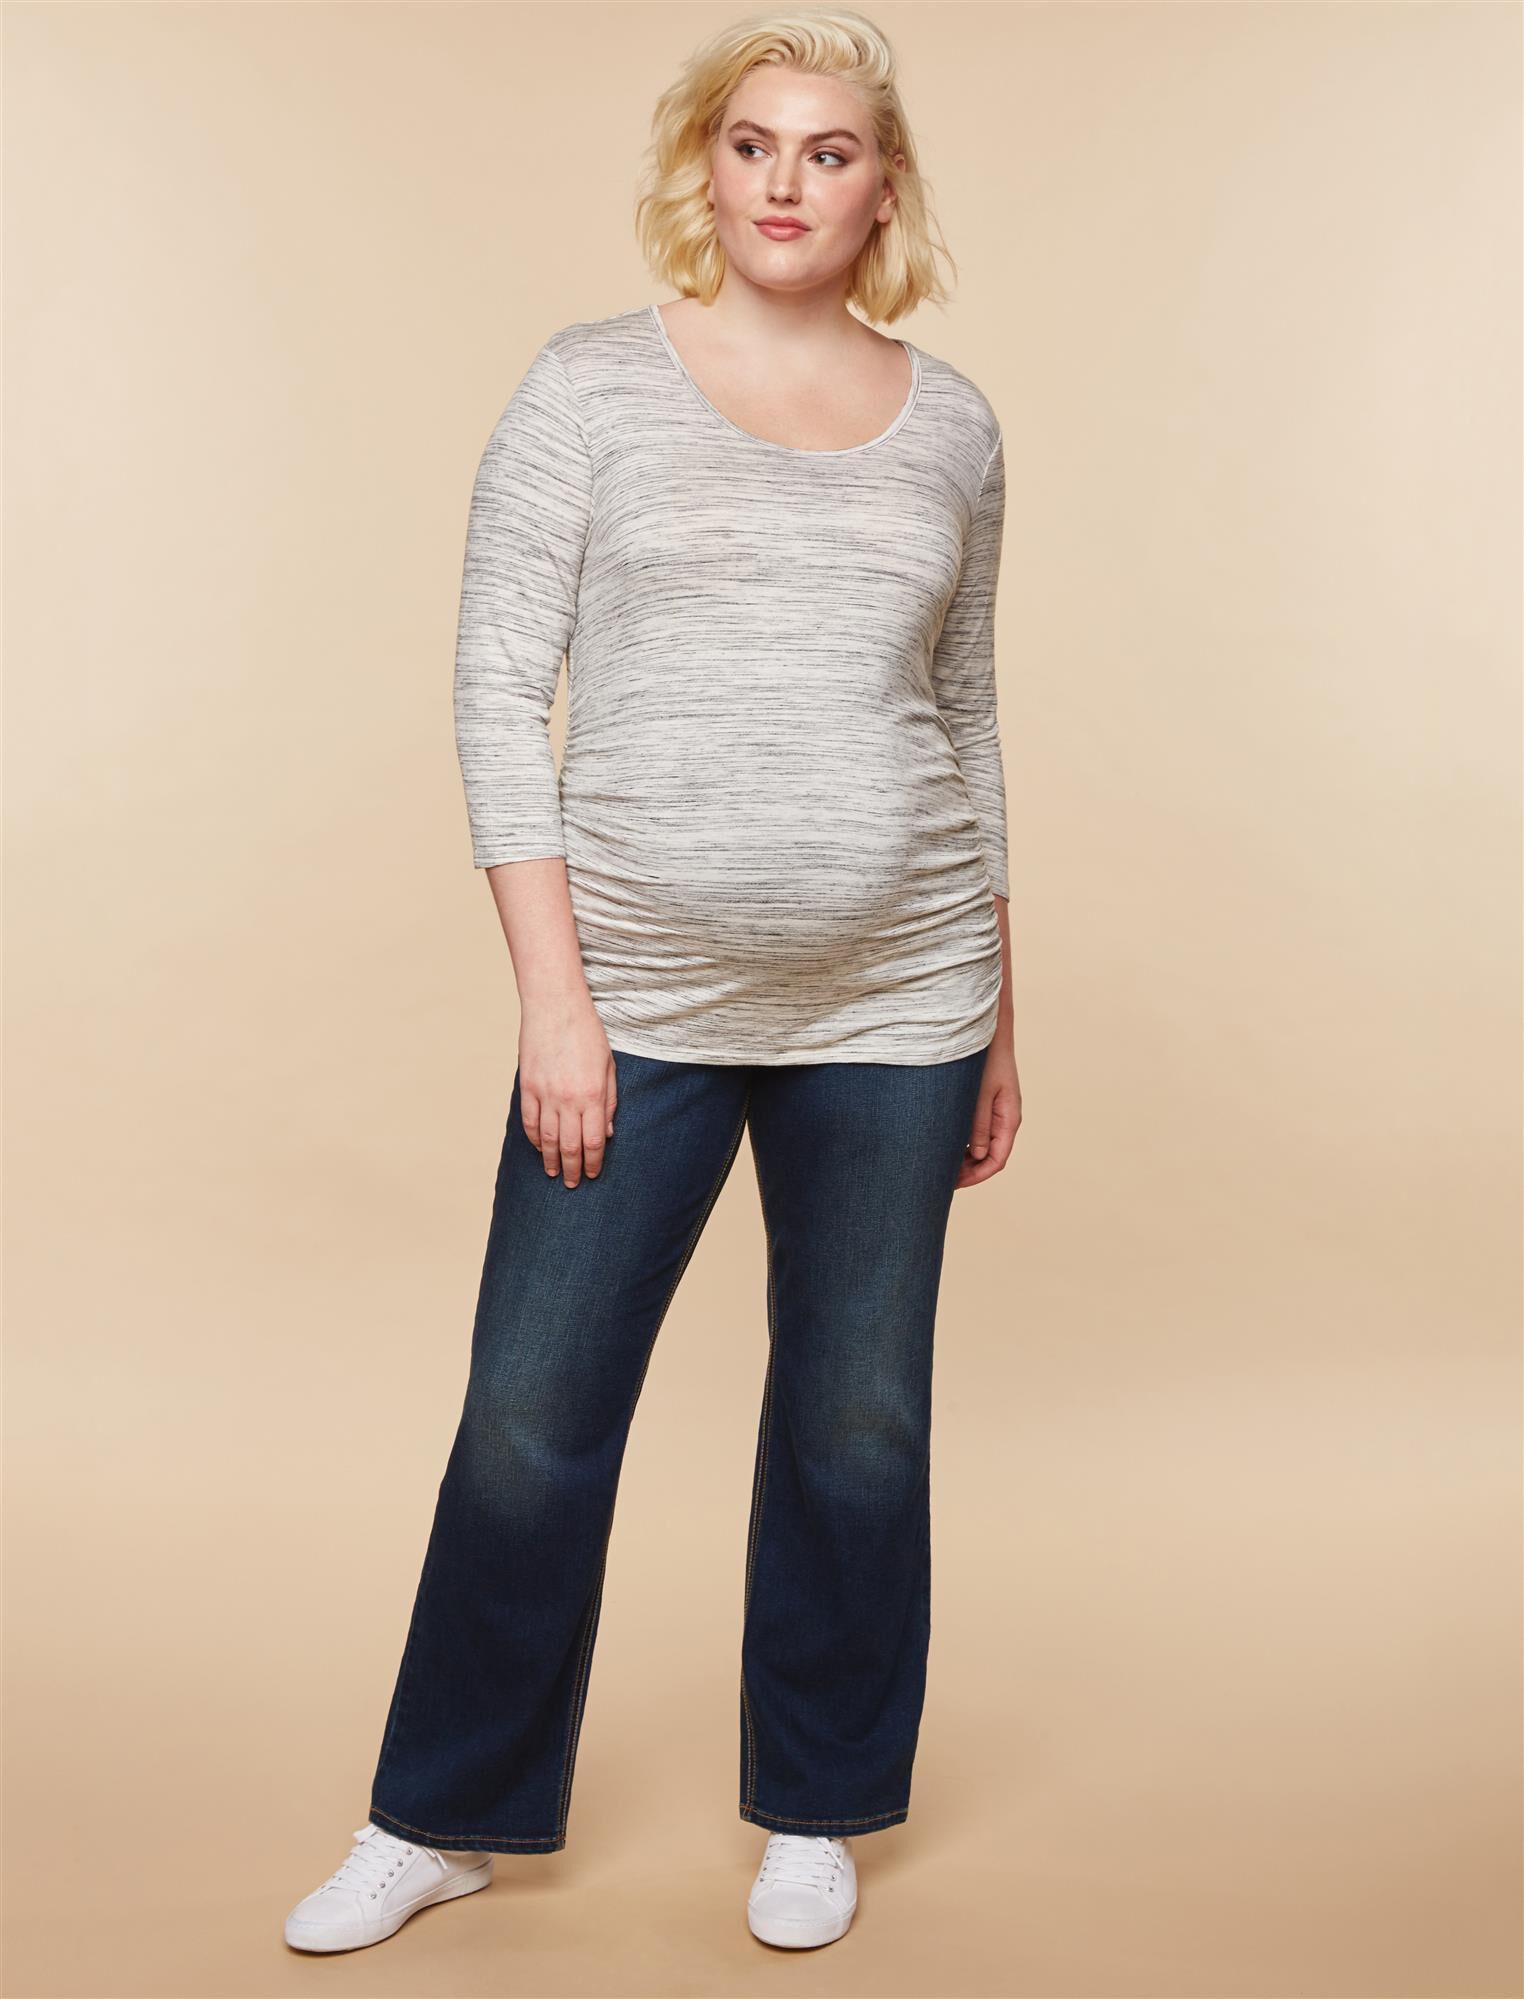 Jessica Simpson Plus Size Secret Fit Belly Dark Boot Maternity Jeans